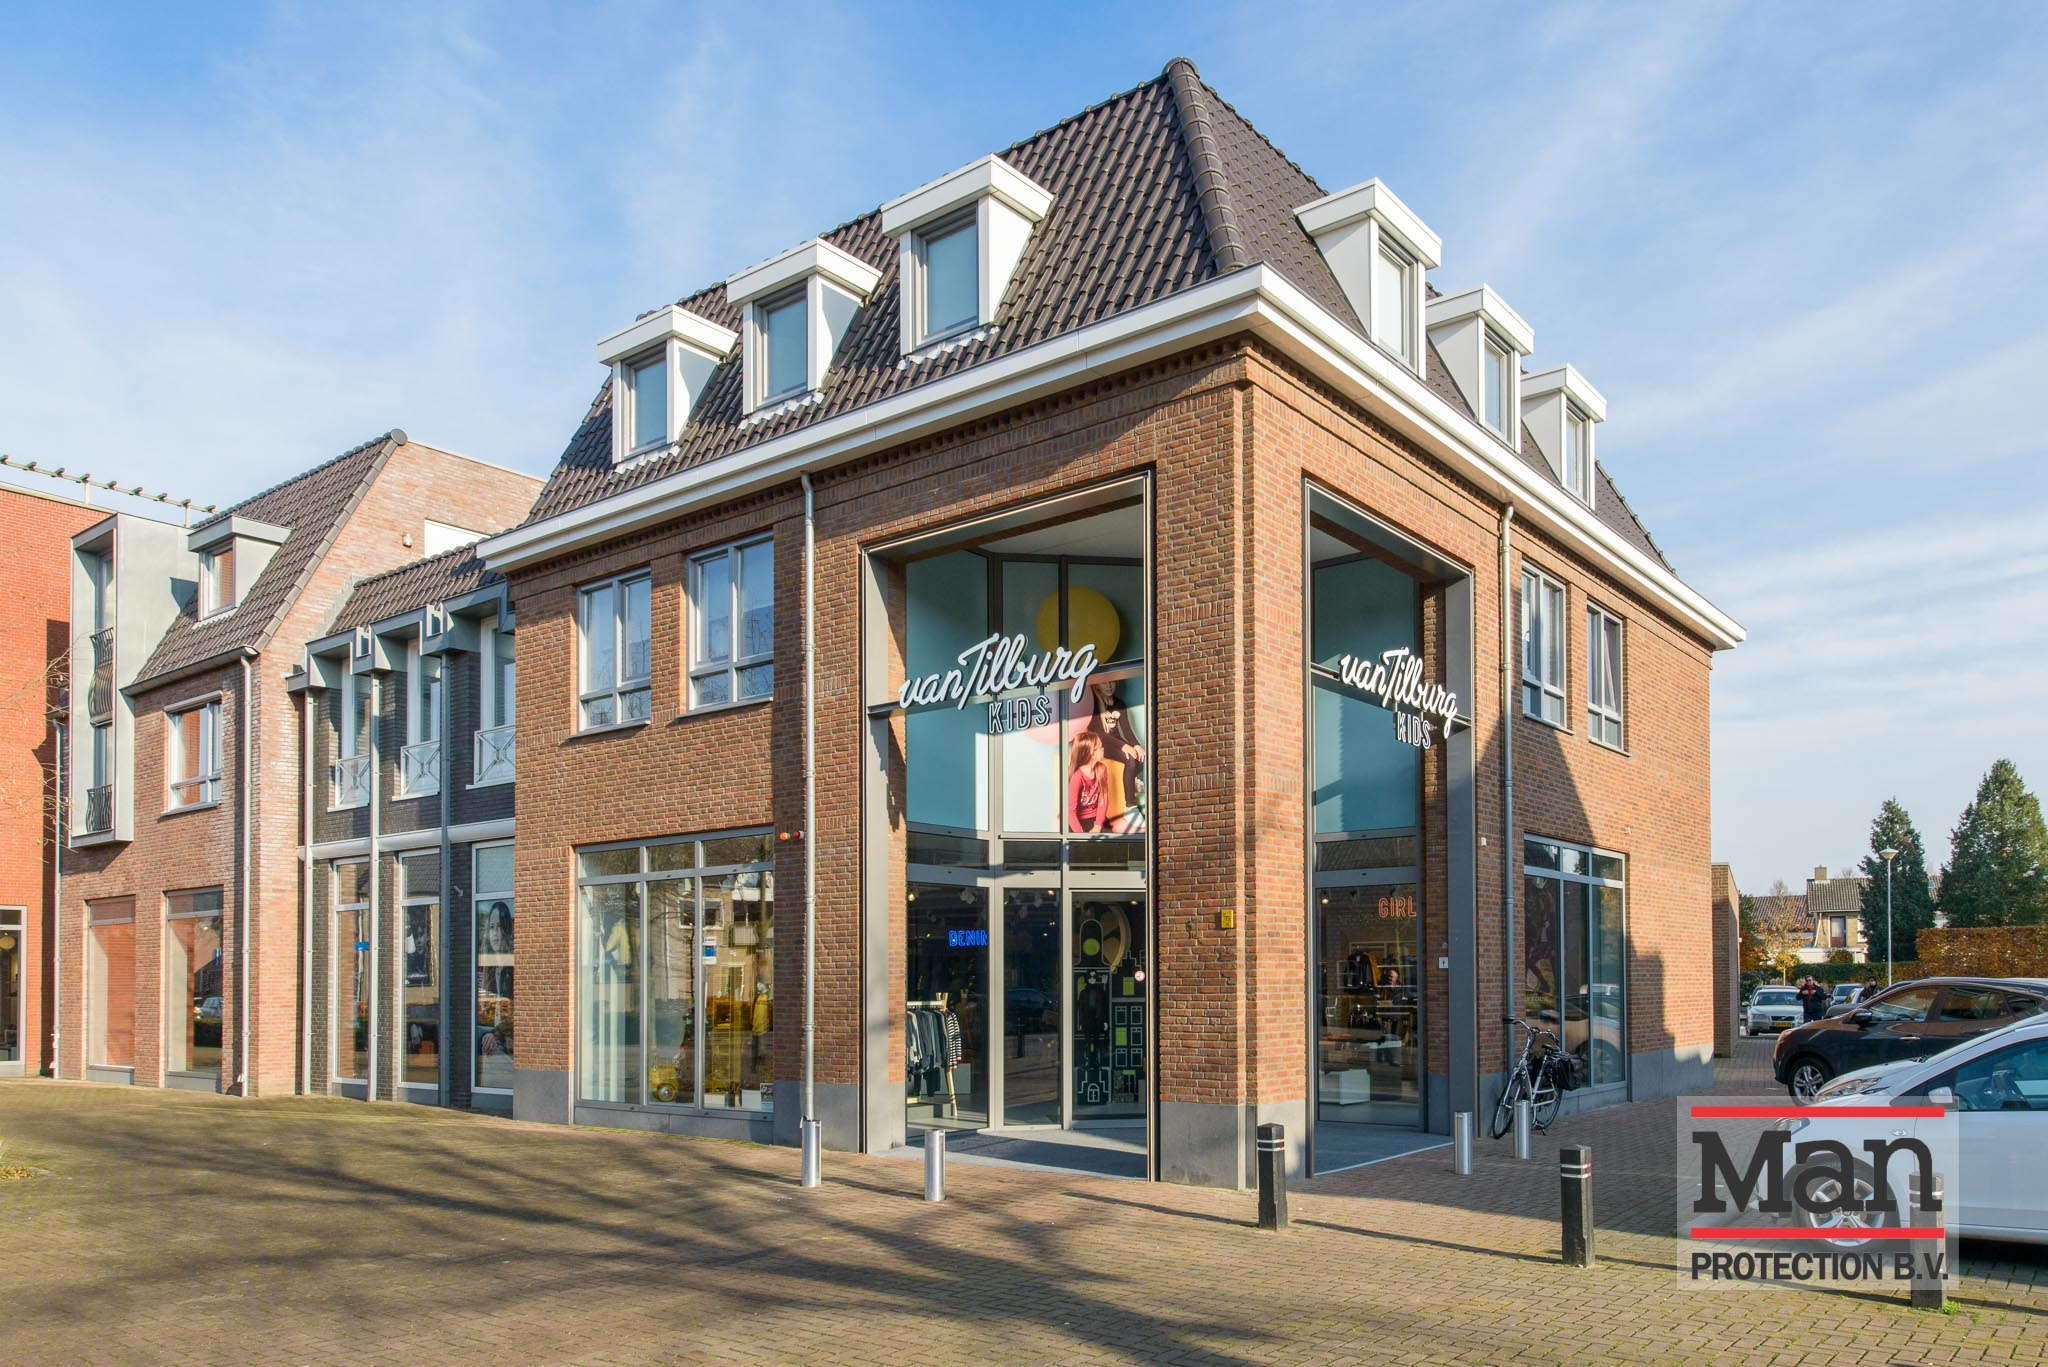 UV-werende glasfolie - Van Tilburg Mode